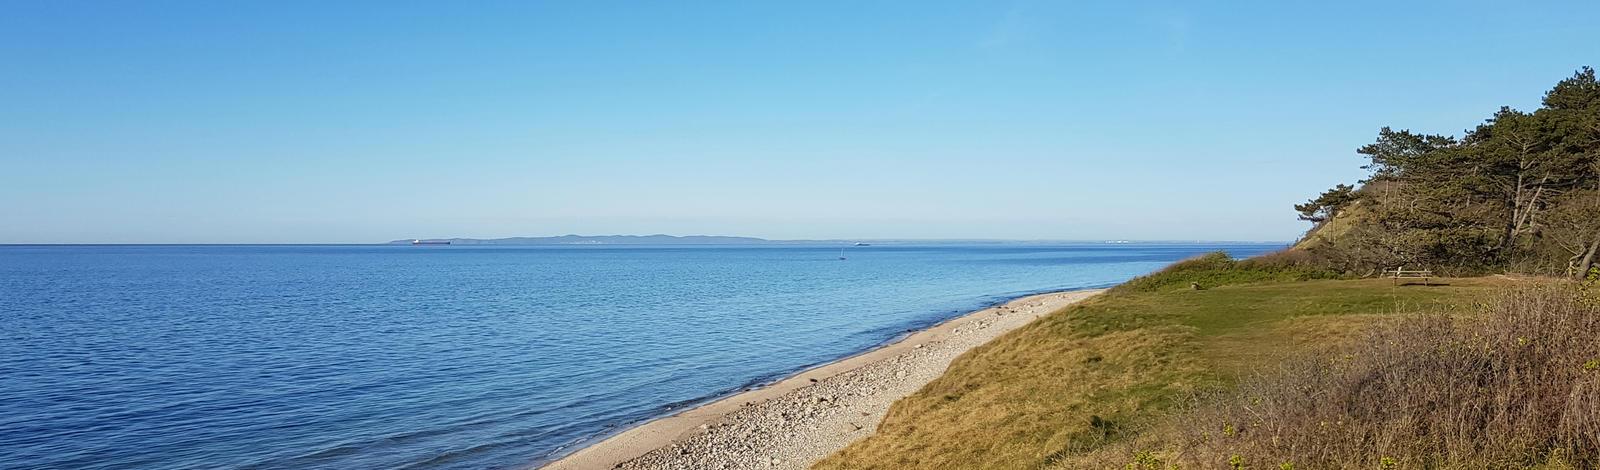 The Coast - Gilleleje by casper033